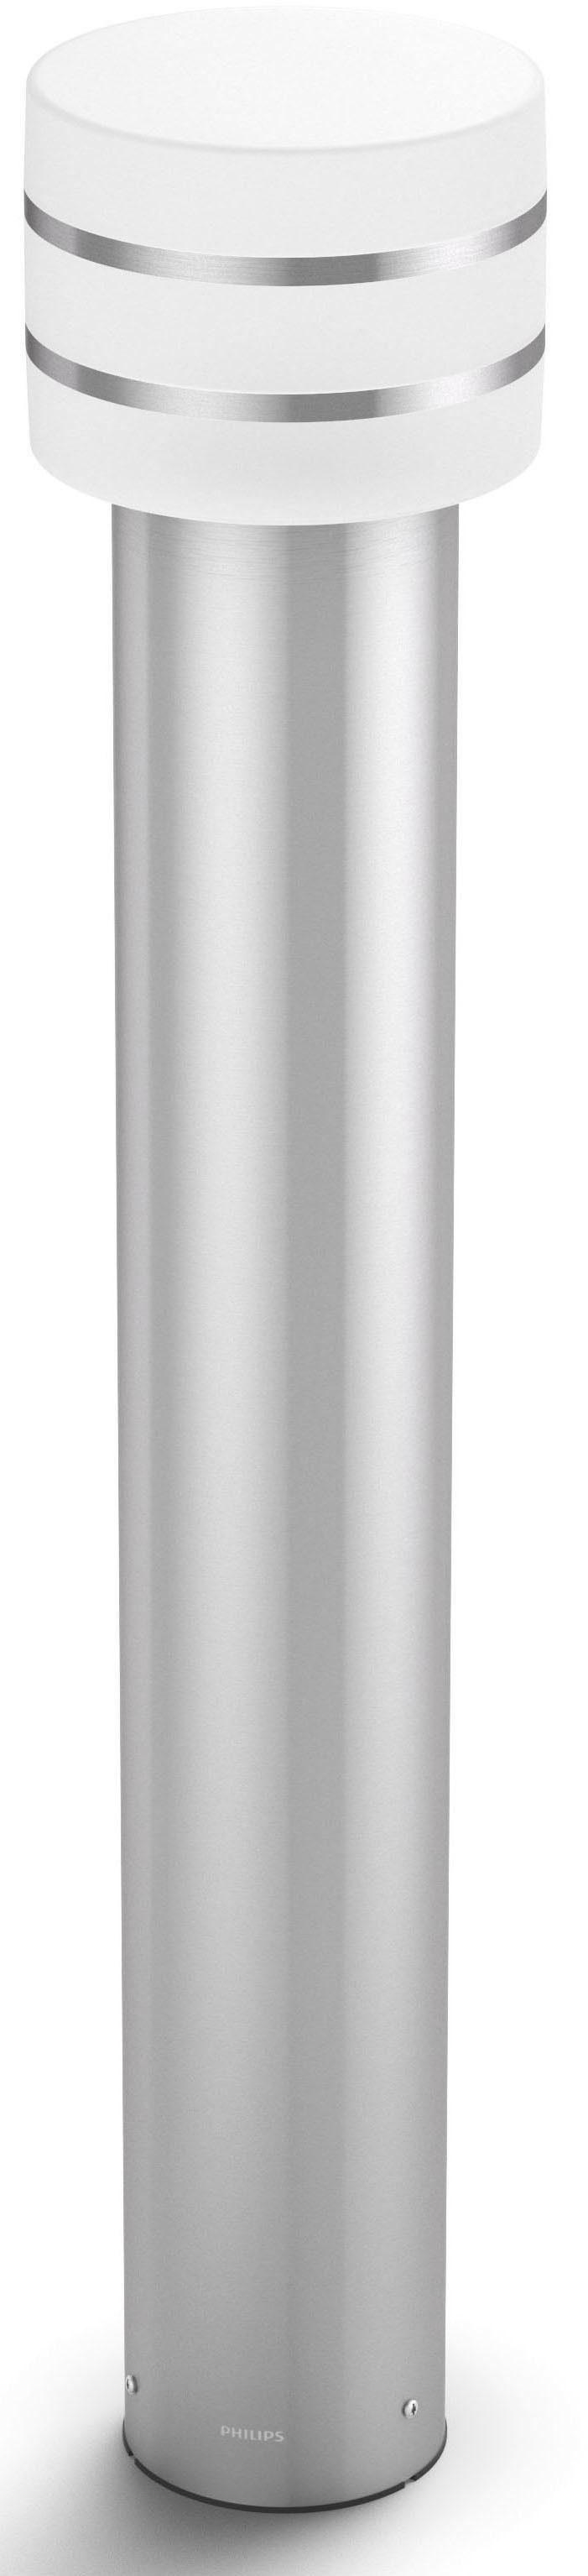 Philips Hue LED Pollerleuchte »Tuar«, 1-flammig, LED Wegeleuchte - smartes LED-Lichtsystem mit App-Steuerung